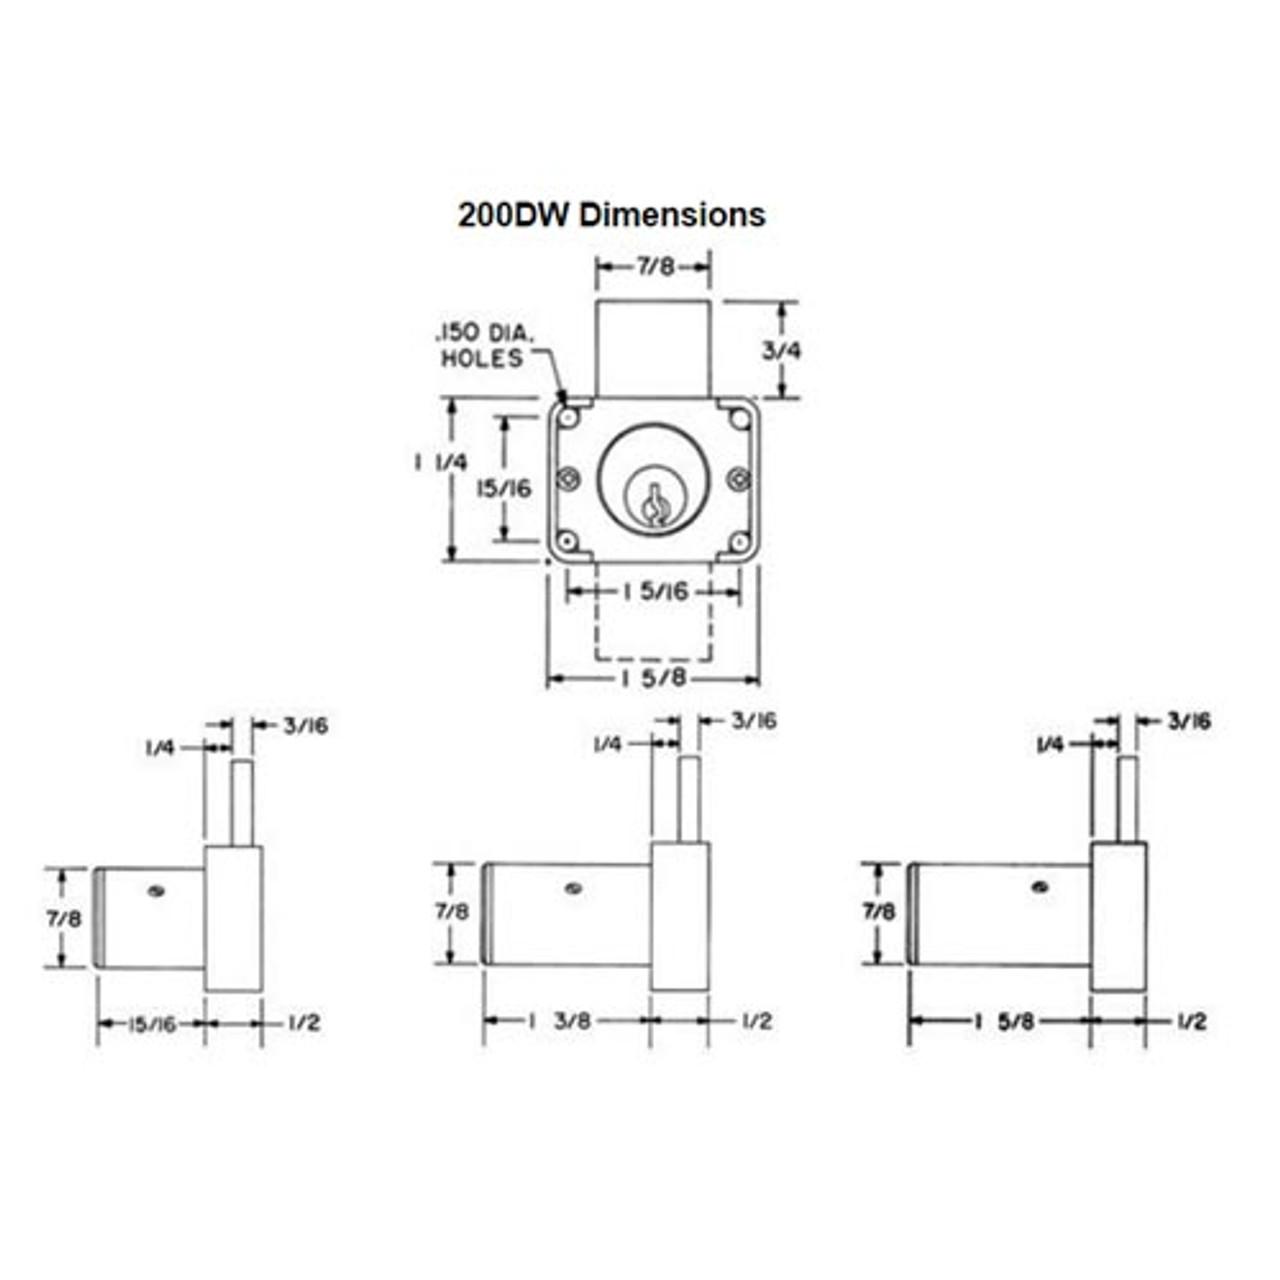 Olympus 200DW-KA103-26D-7/8 N Series Drawer Deadbolt Cabinet Locks in Satin Chrome